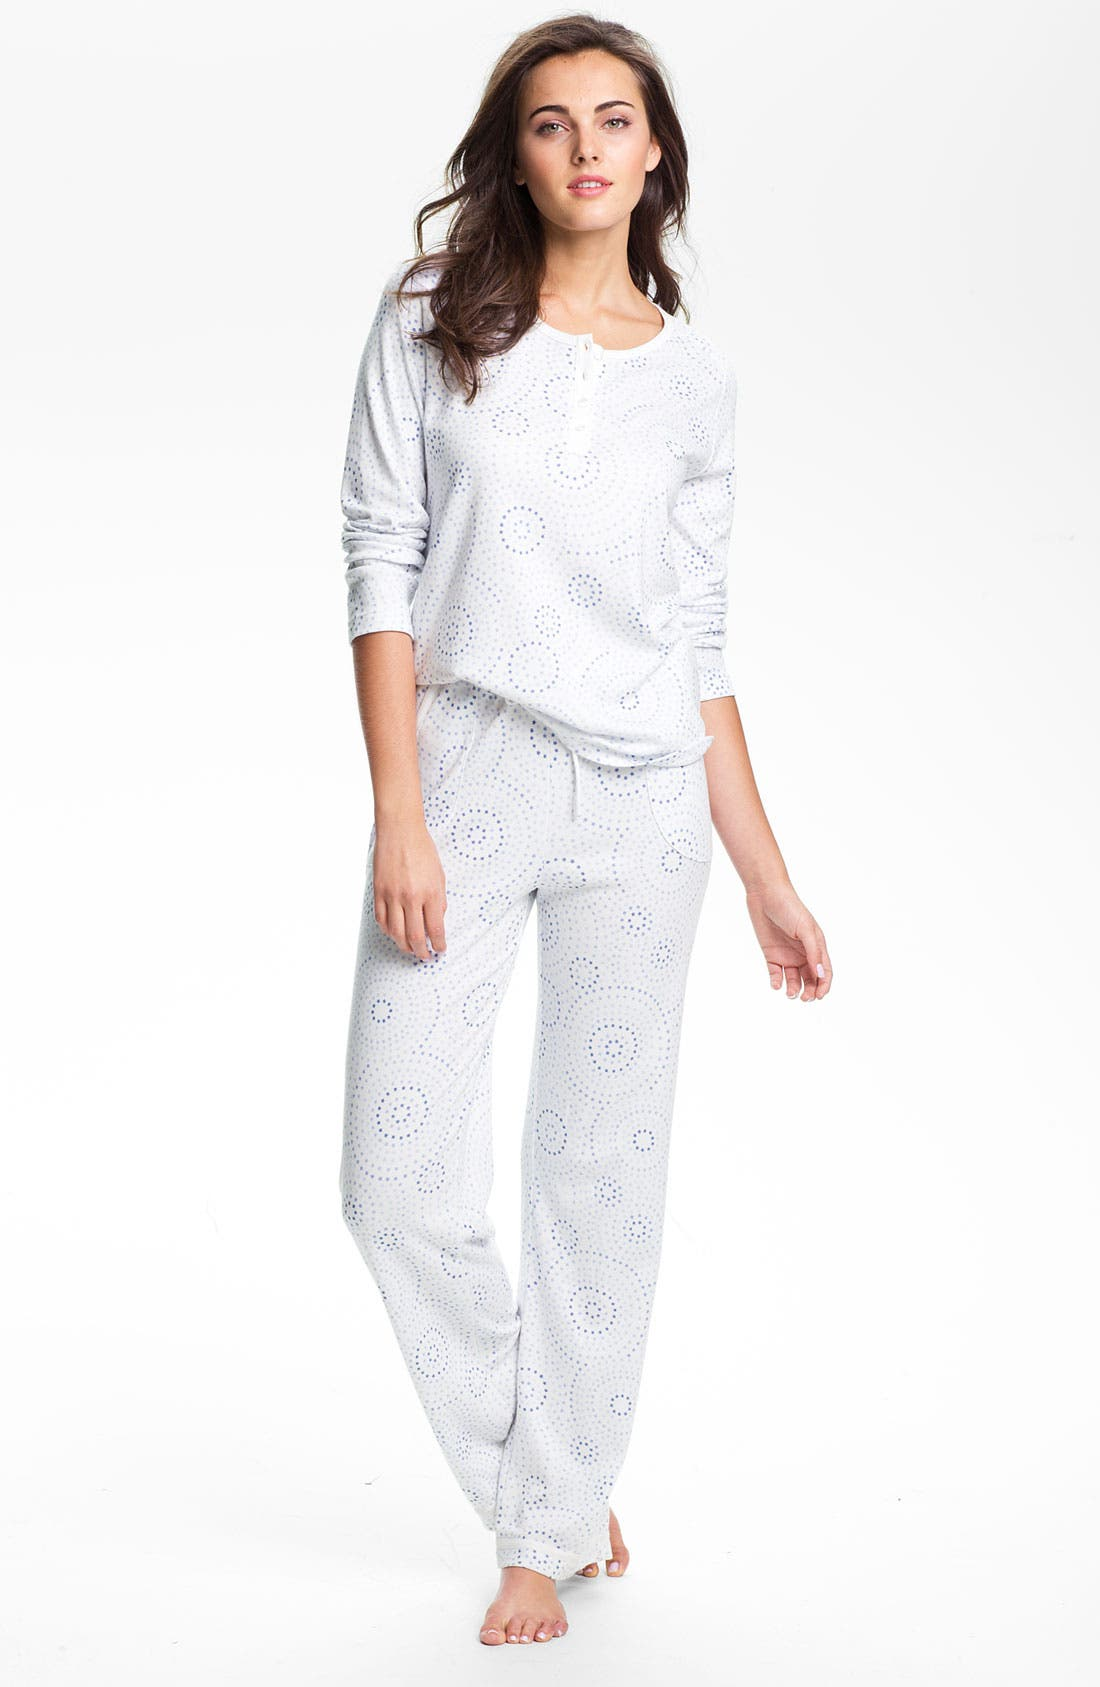 Alternate Image 1 Selected - Carole Hochman Designs Interlock Knit Pajamas